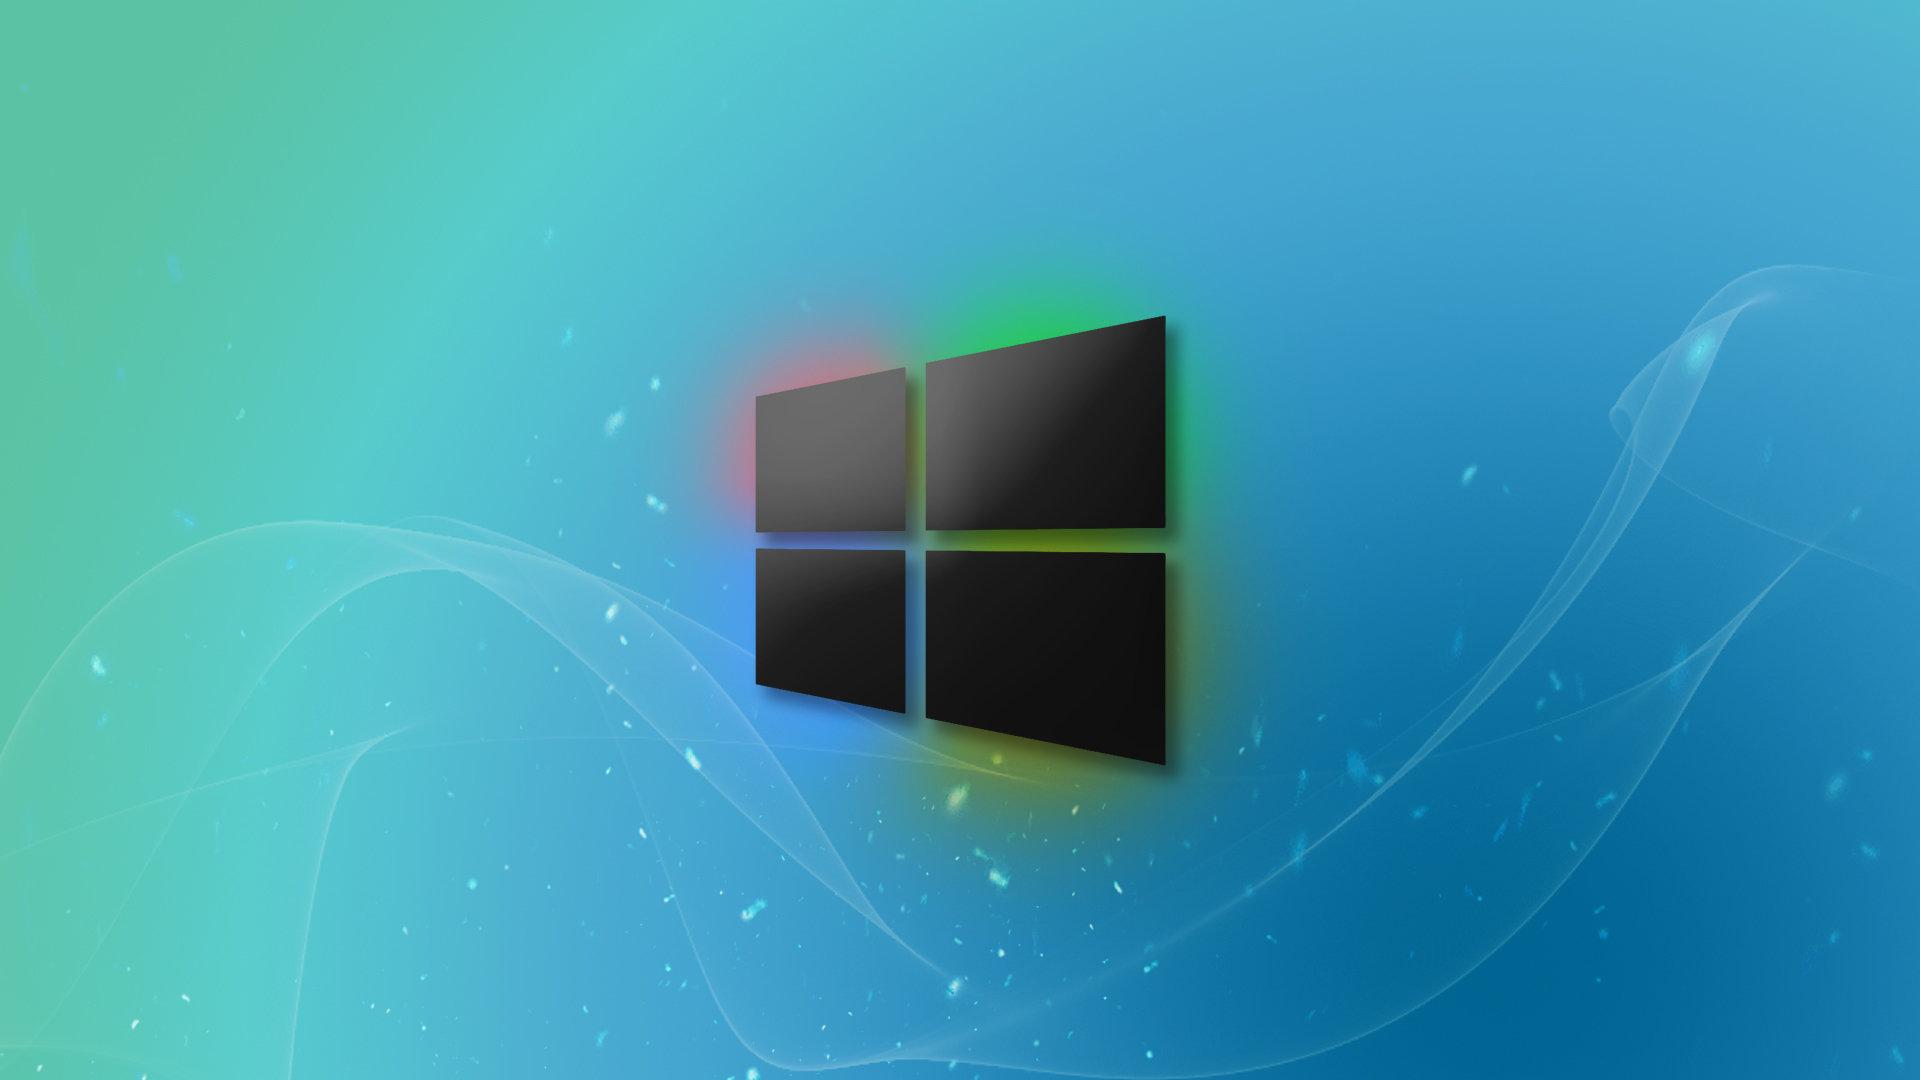 High Resolution Windows Full Hd 1920x1080 Wallpaper ID59960 For Computer